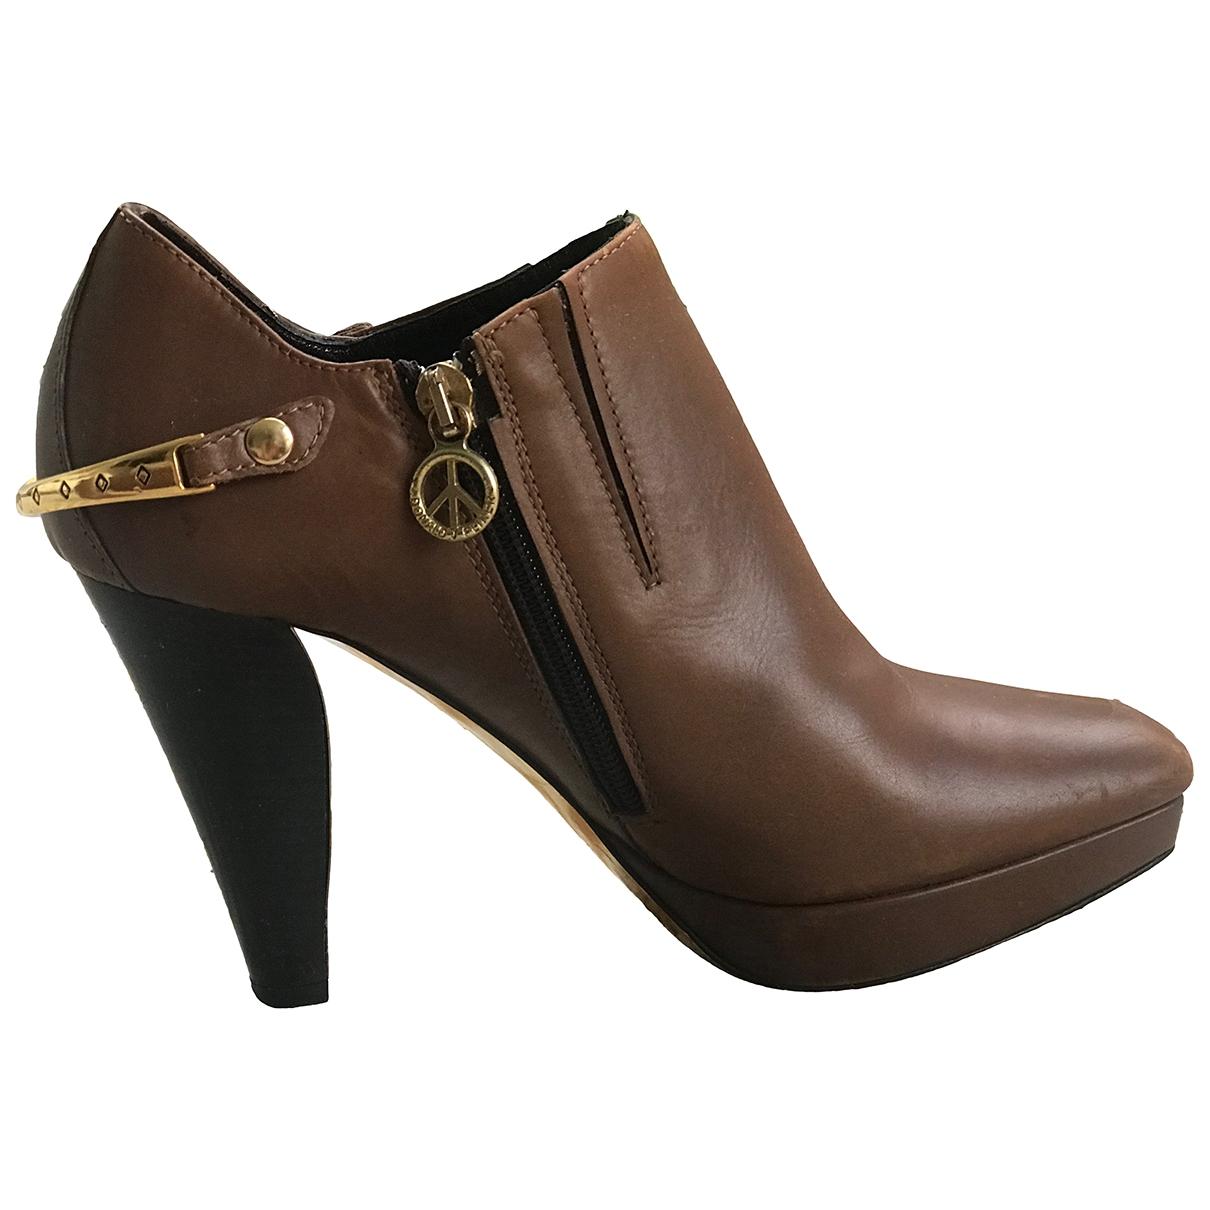 Russell & Bromley - Boots   pour femme en cuir - marron